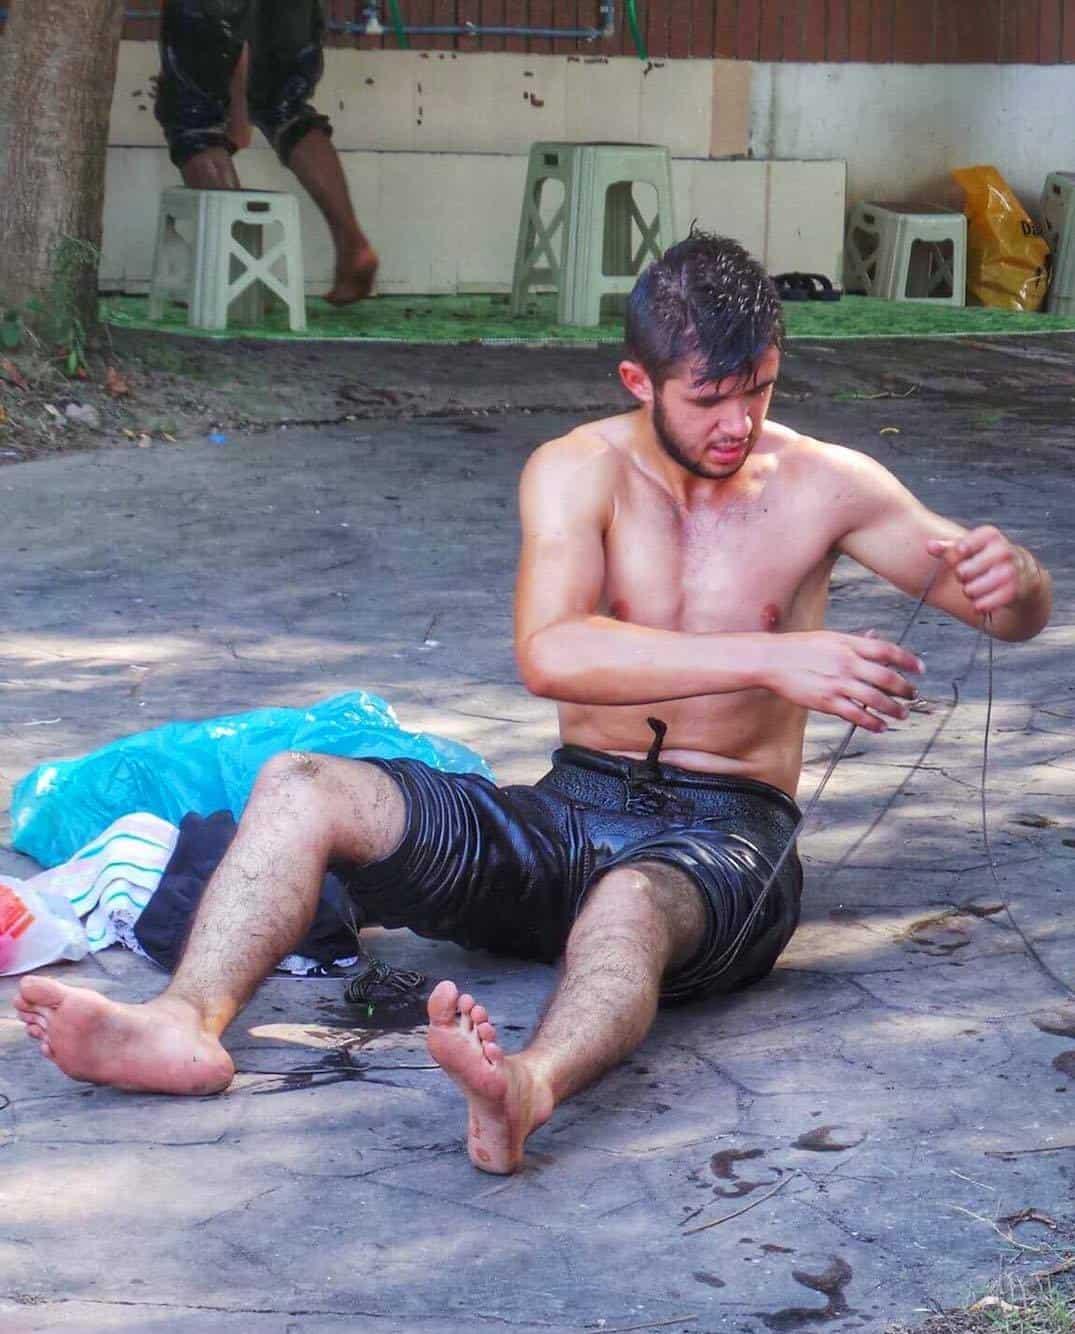 turkish oil wrestler lacing his kismet (uniform)